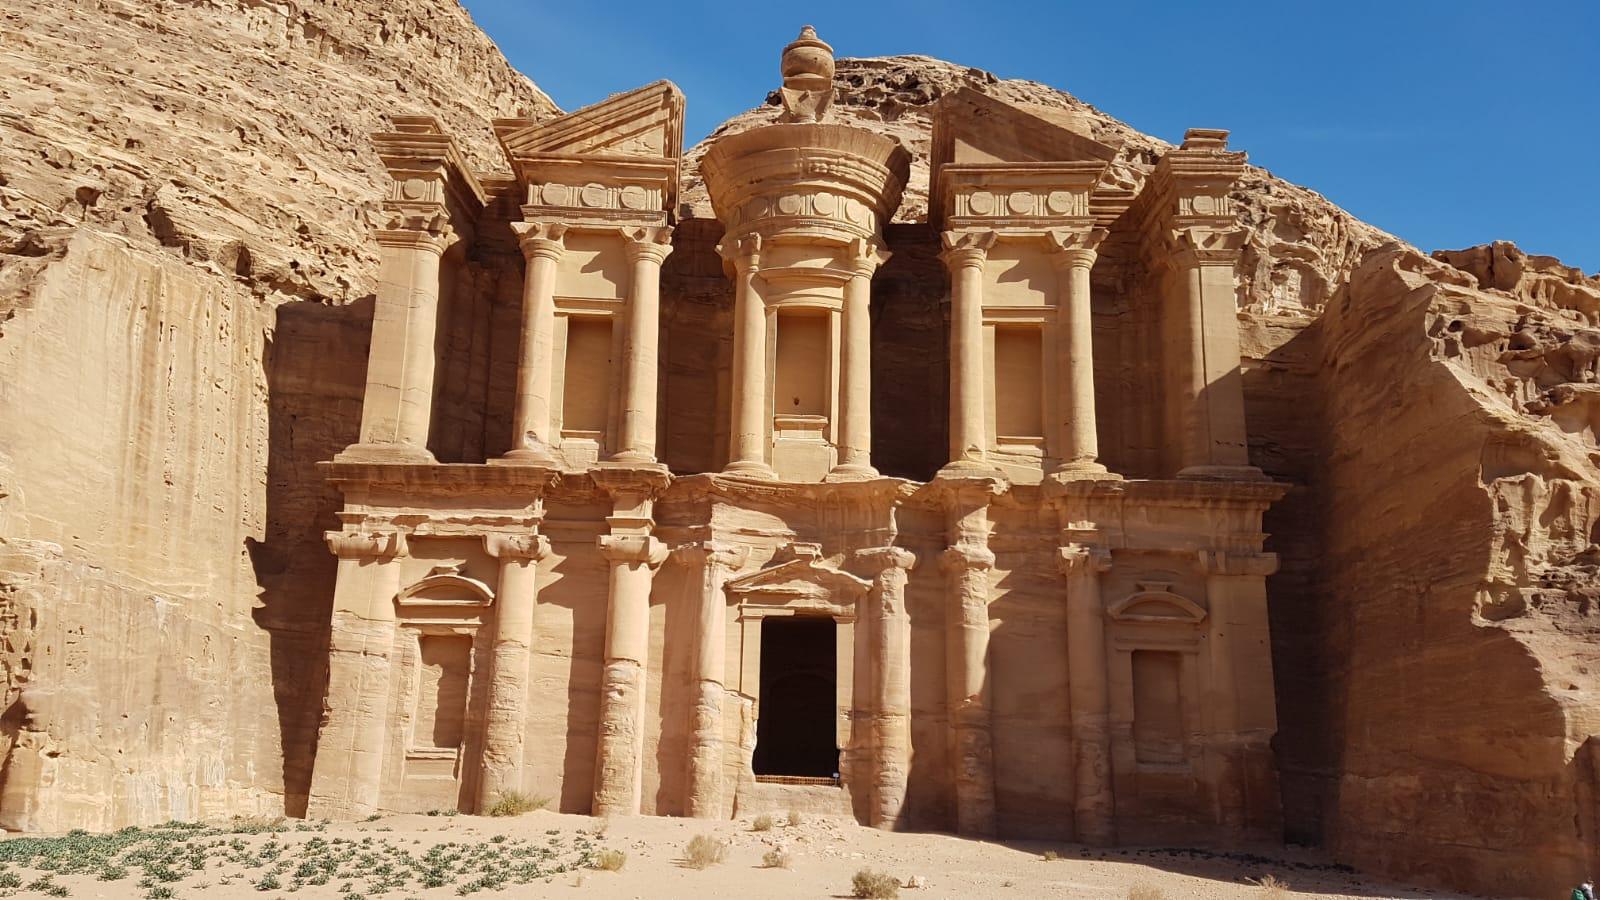 Klášter tedy hrobka Ad-Deir